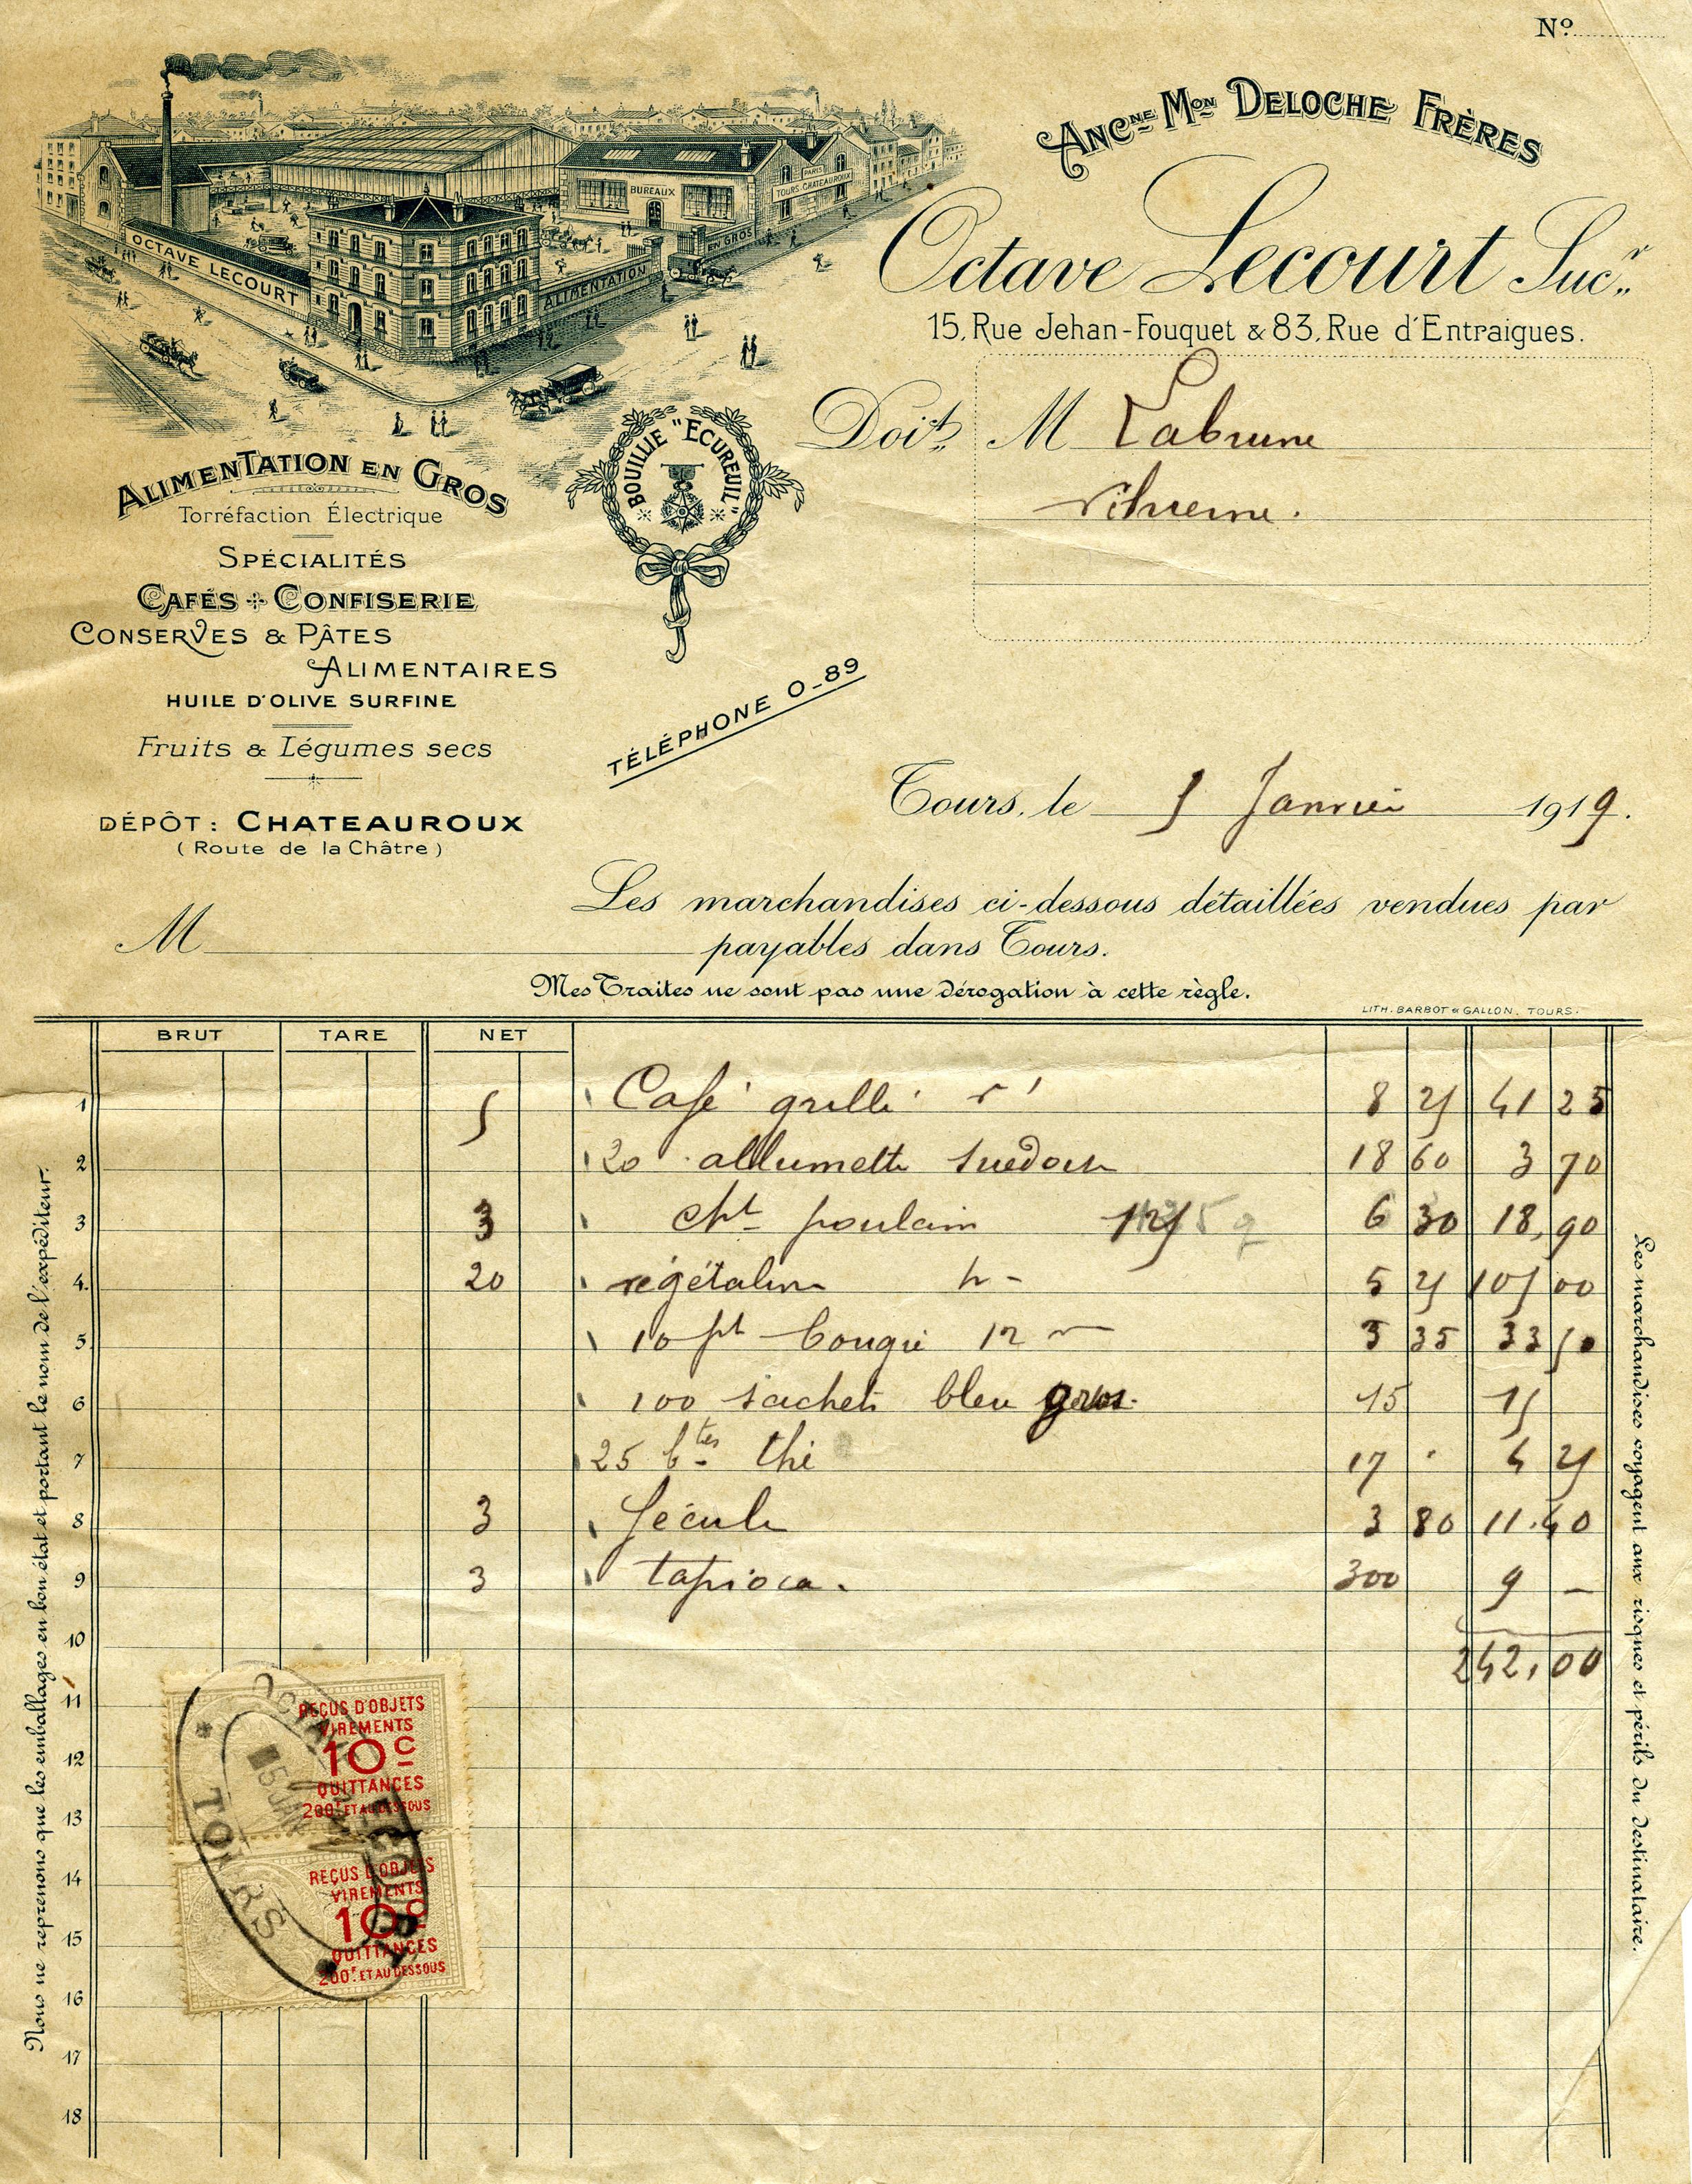 Vintage Invoice 110